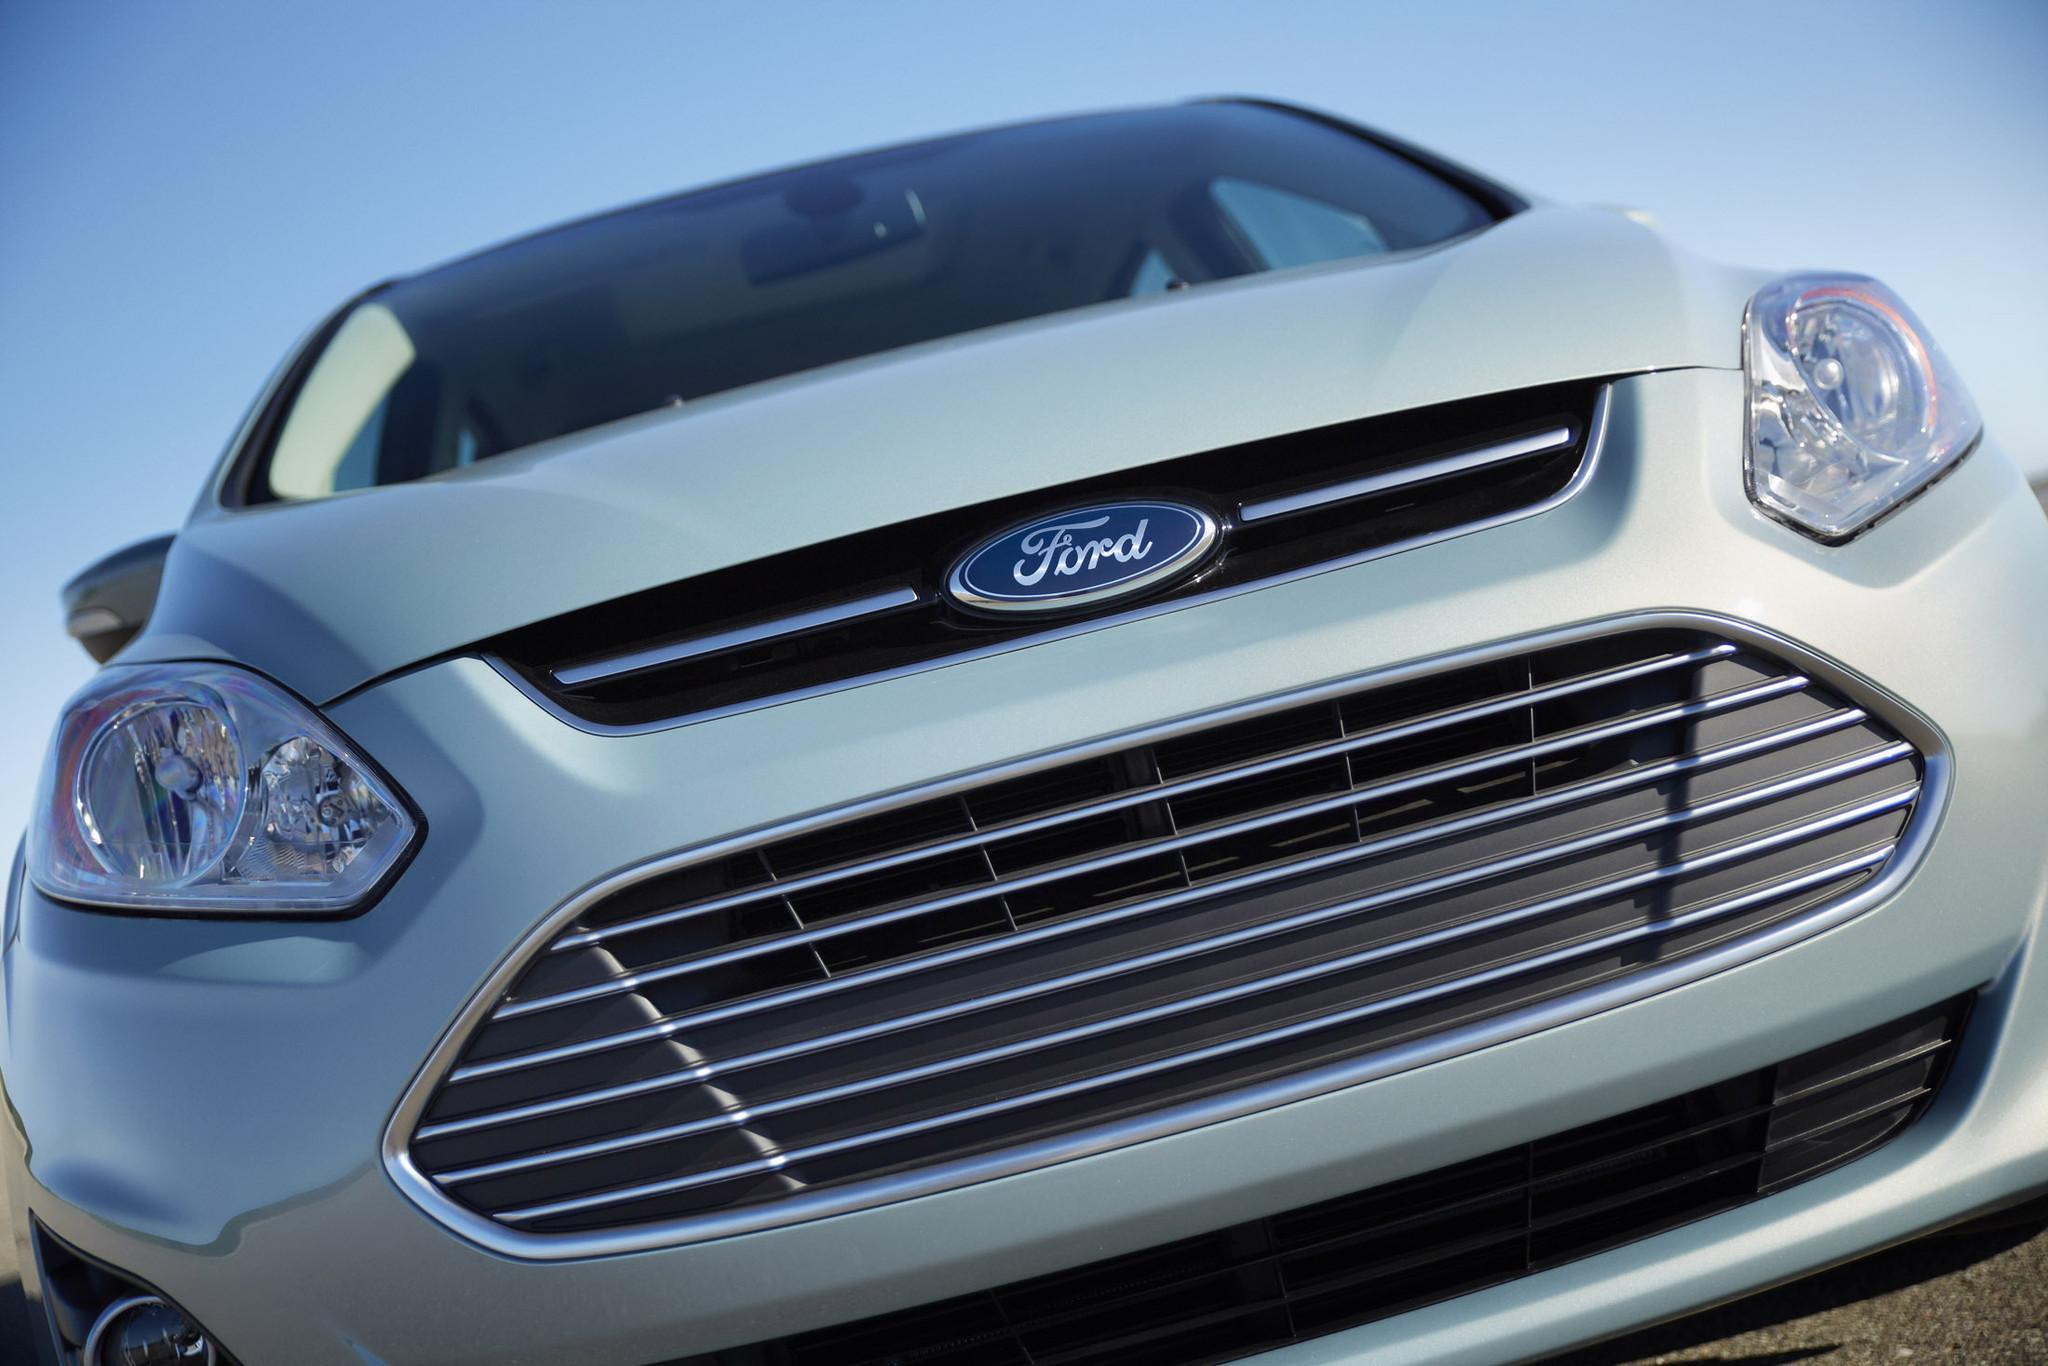 ford recalls 850 000 vehicles for airbag problem la times. Black Bedroom Furniture Sets. Home Design Ideas